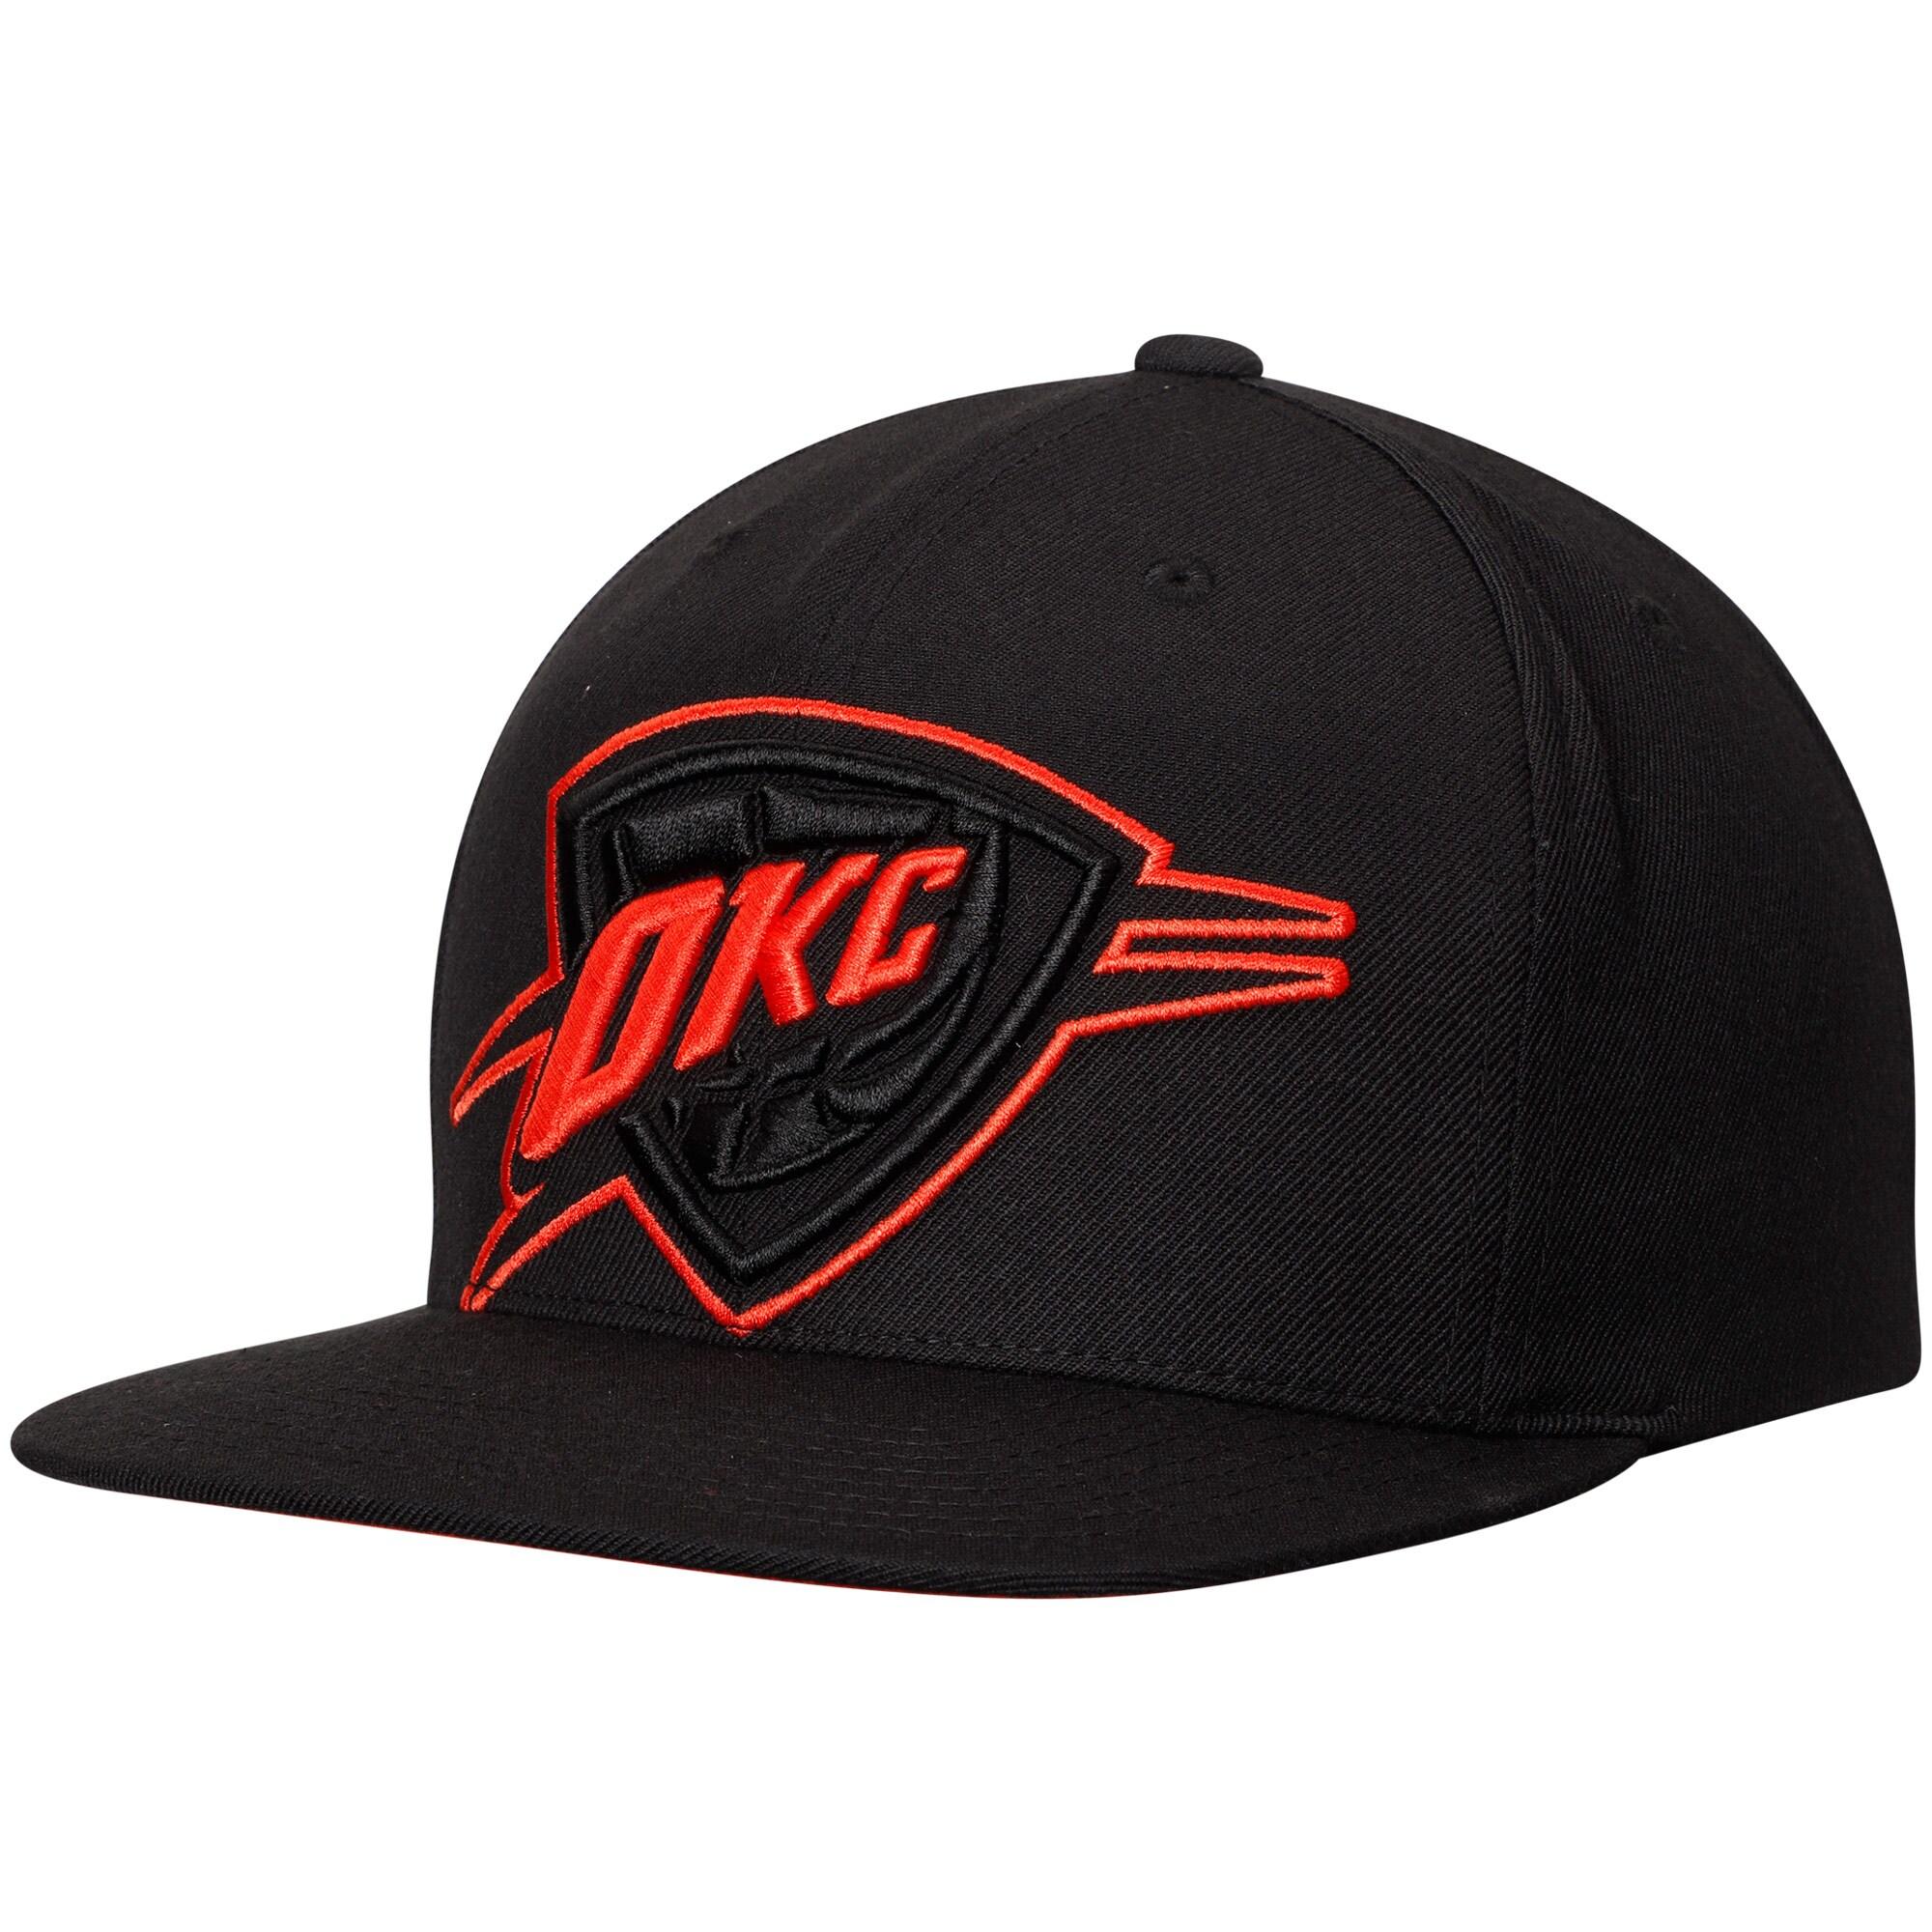 Oklahoma City Thunder Mitchell & Ness Cropped XL Adjustable Snapback Hat - Black